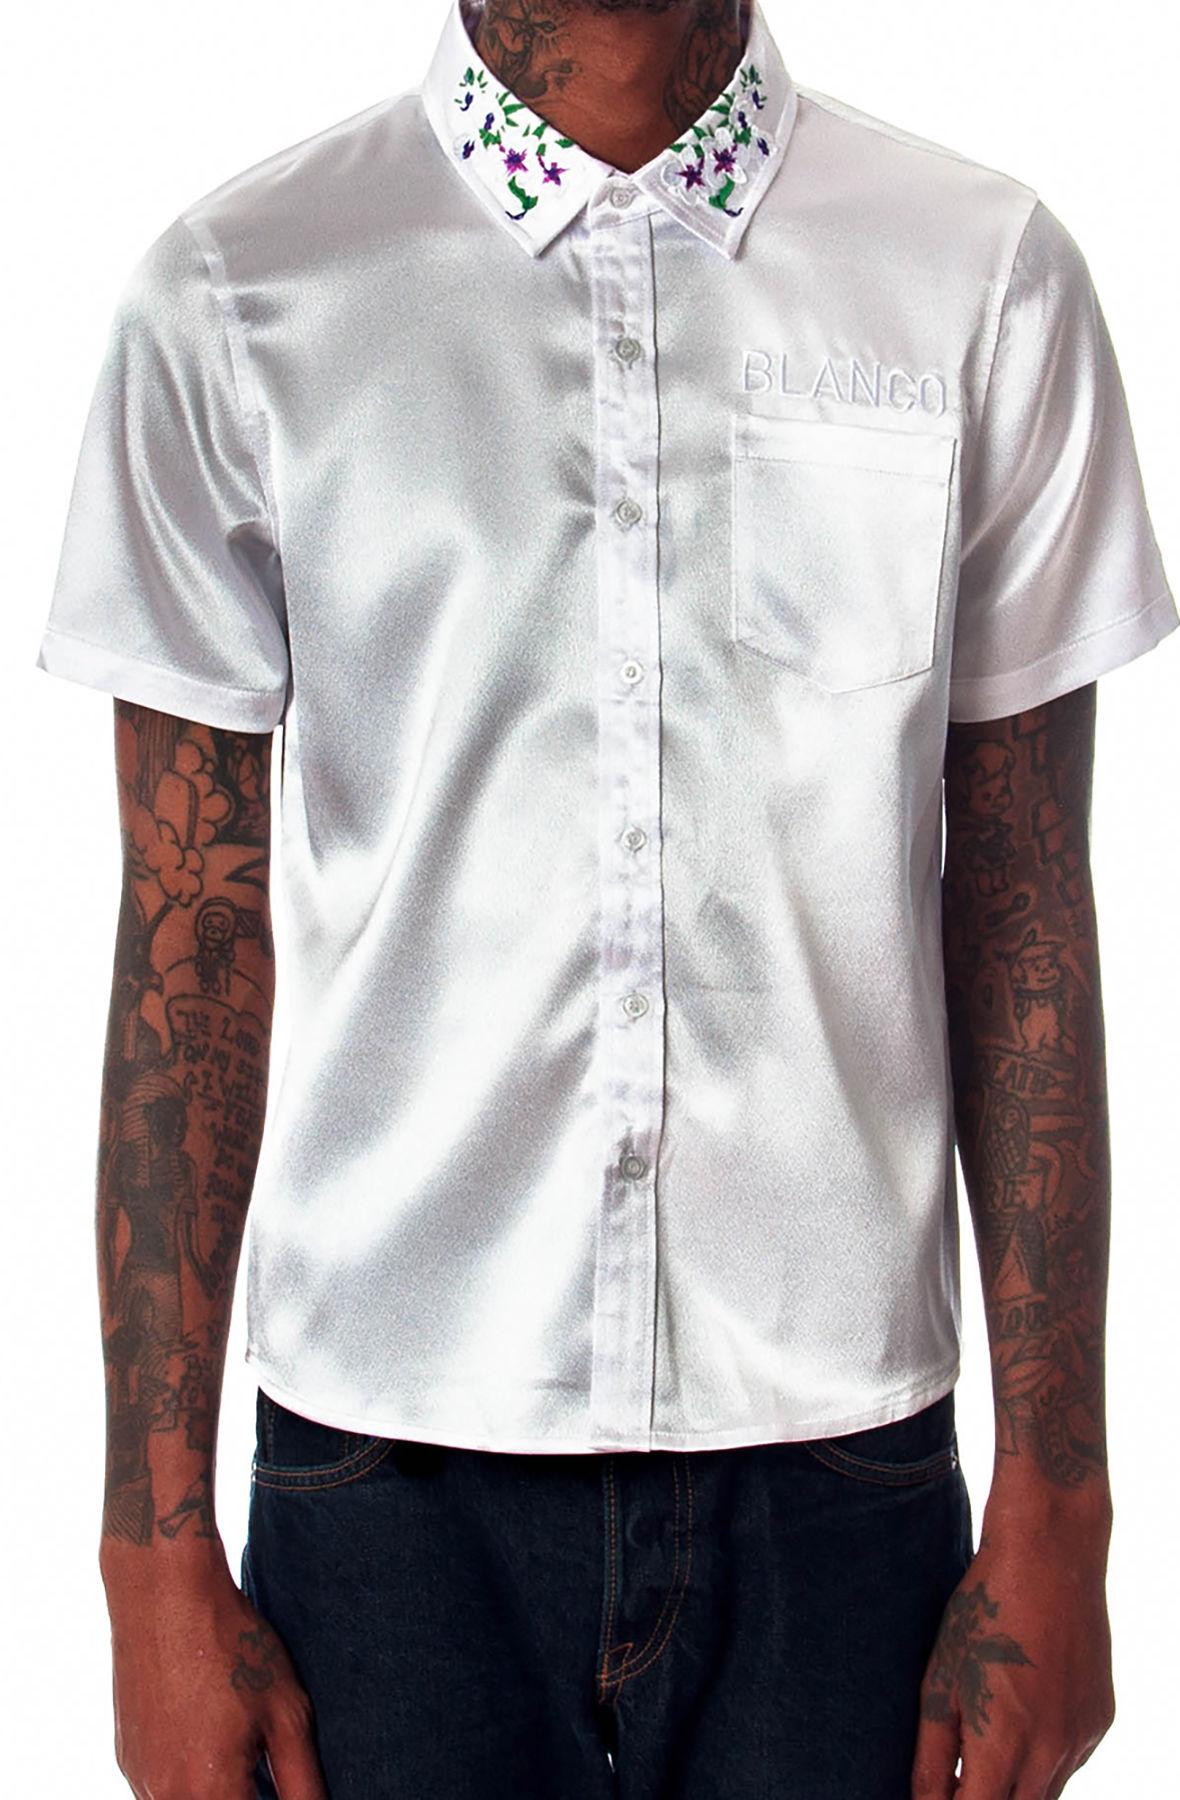 Image of Blanco White Collar SS Shirt (Perico White)